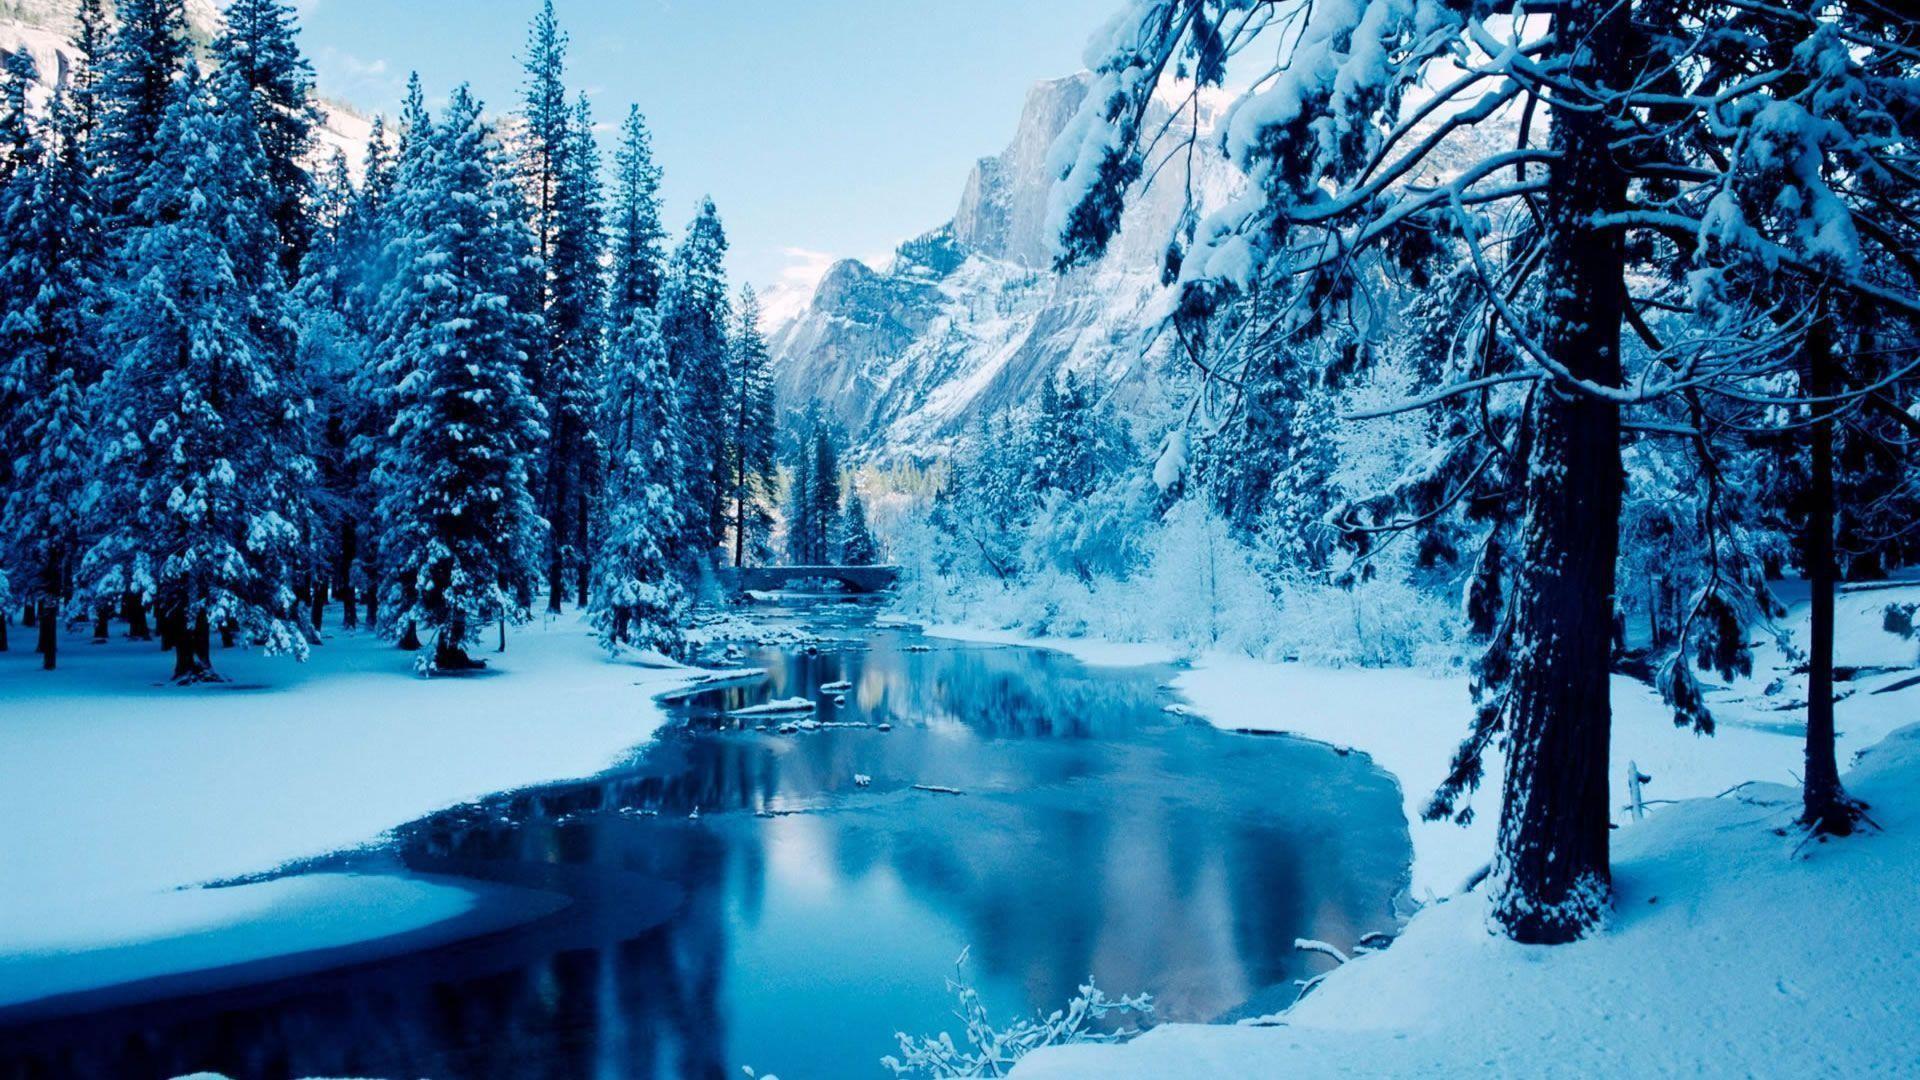 Full HD 1080p <b>Winter Wallpapers</b> HD, Desktop Backgrounds